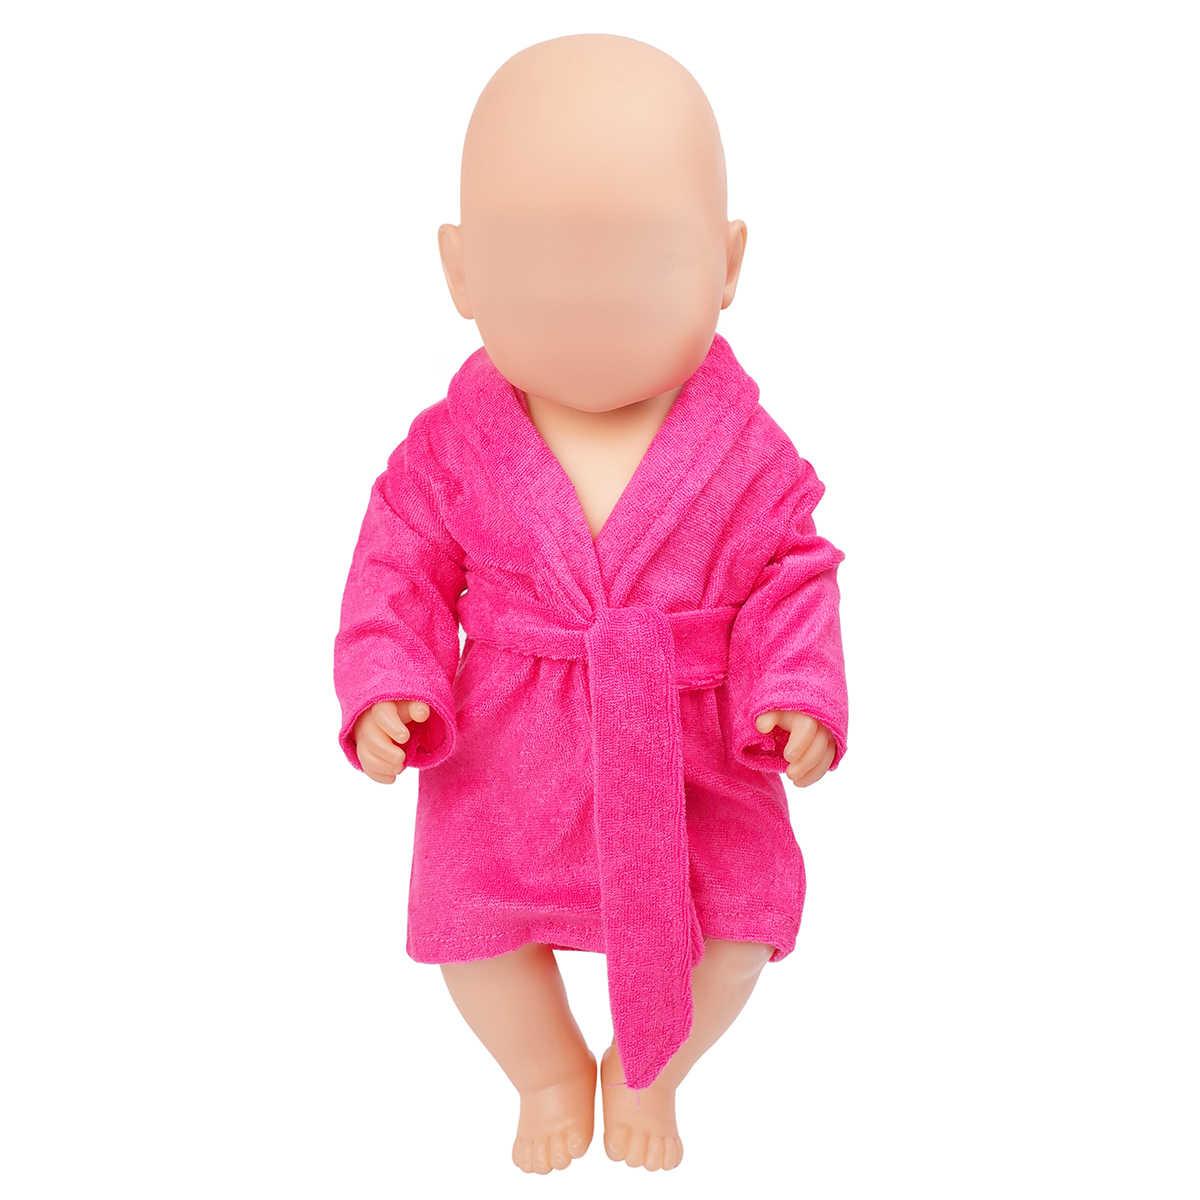 PellyBaby 人形服ローブ新生児パジャマフィット 40-43 センチメートルベビードールバスローブ、紫、ピンク、赤バラ